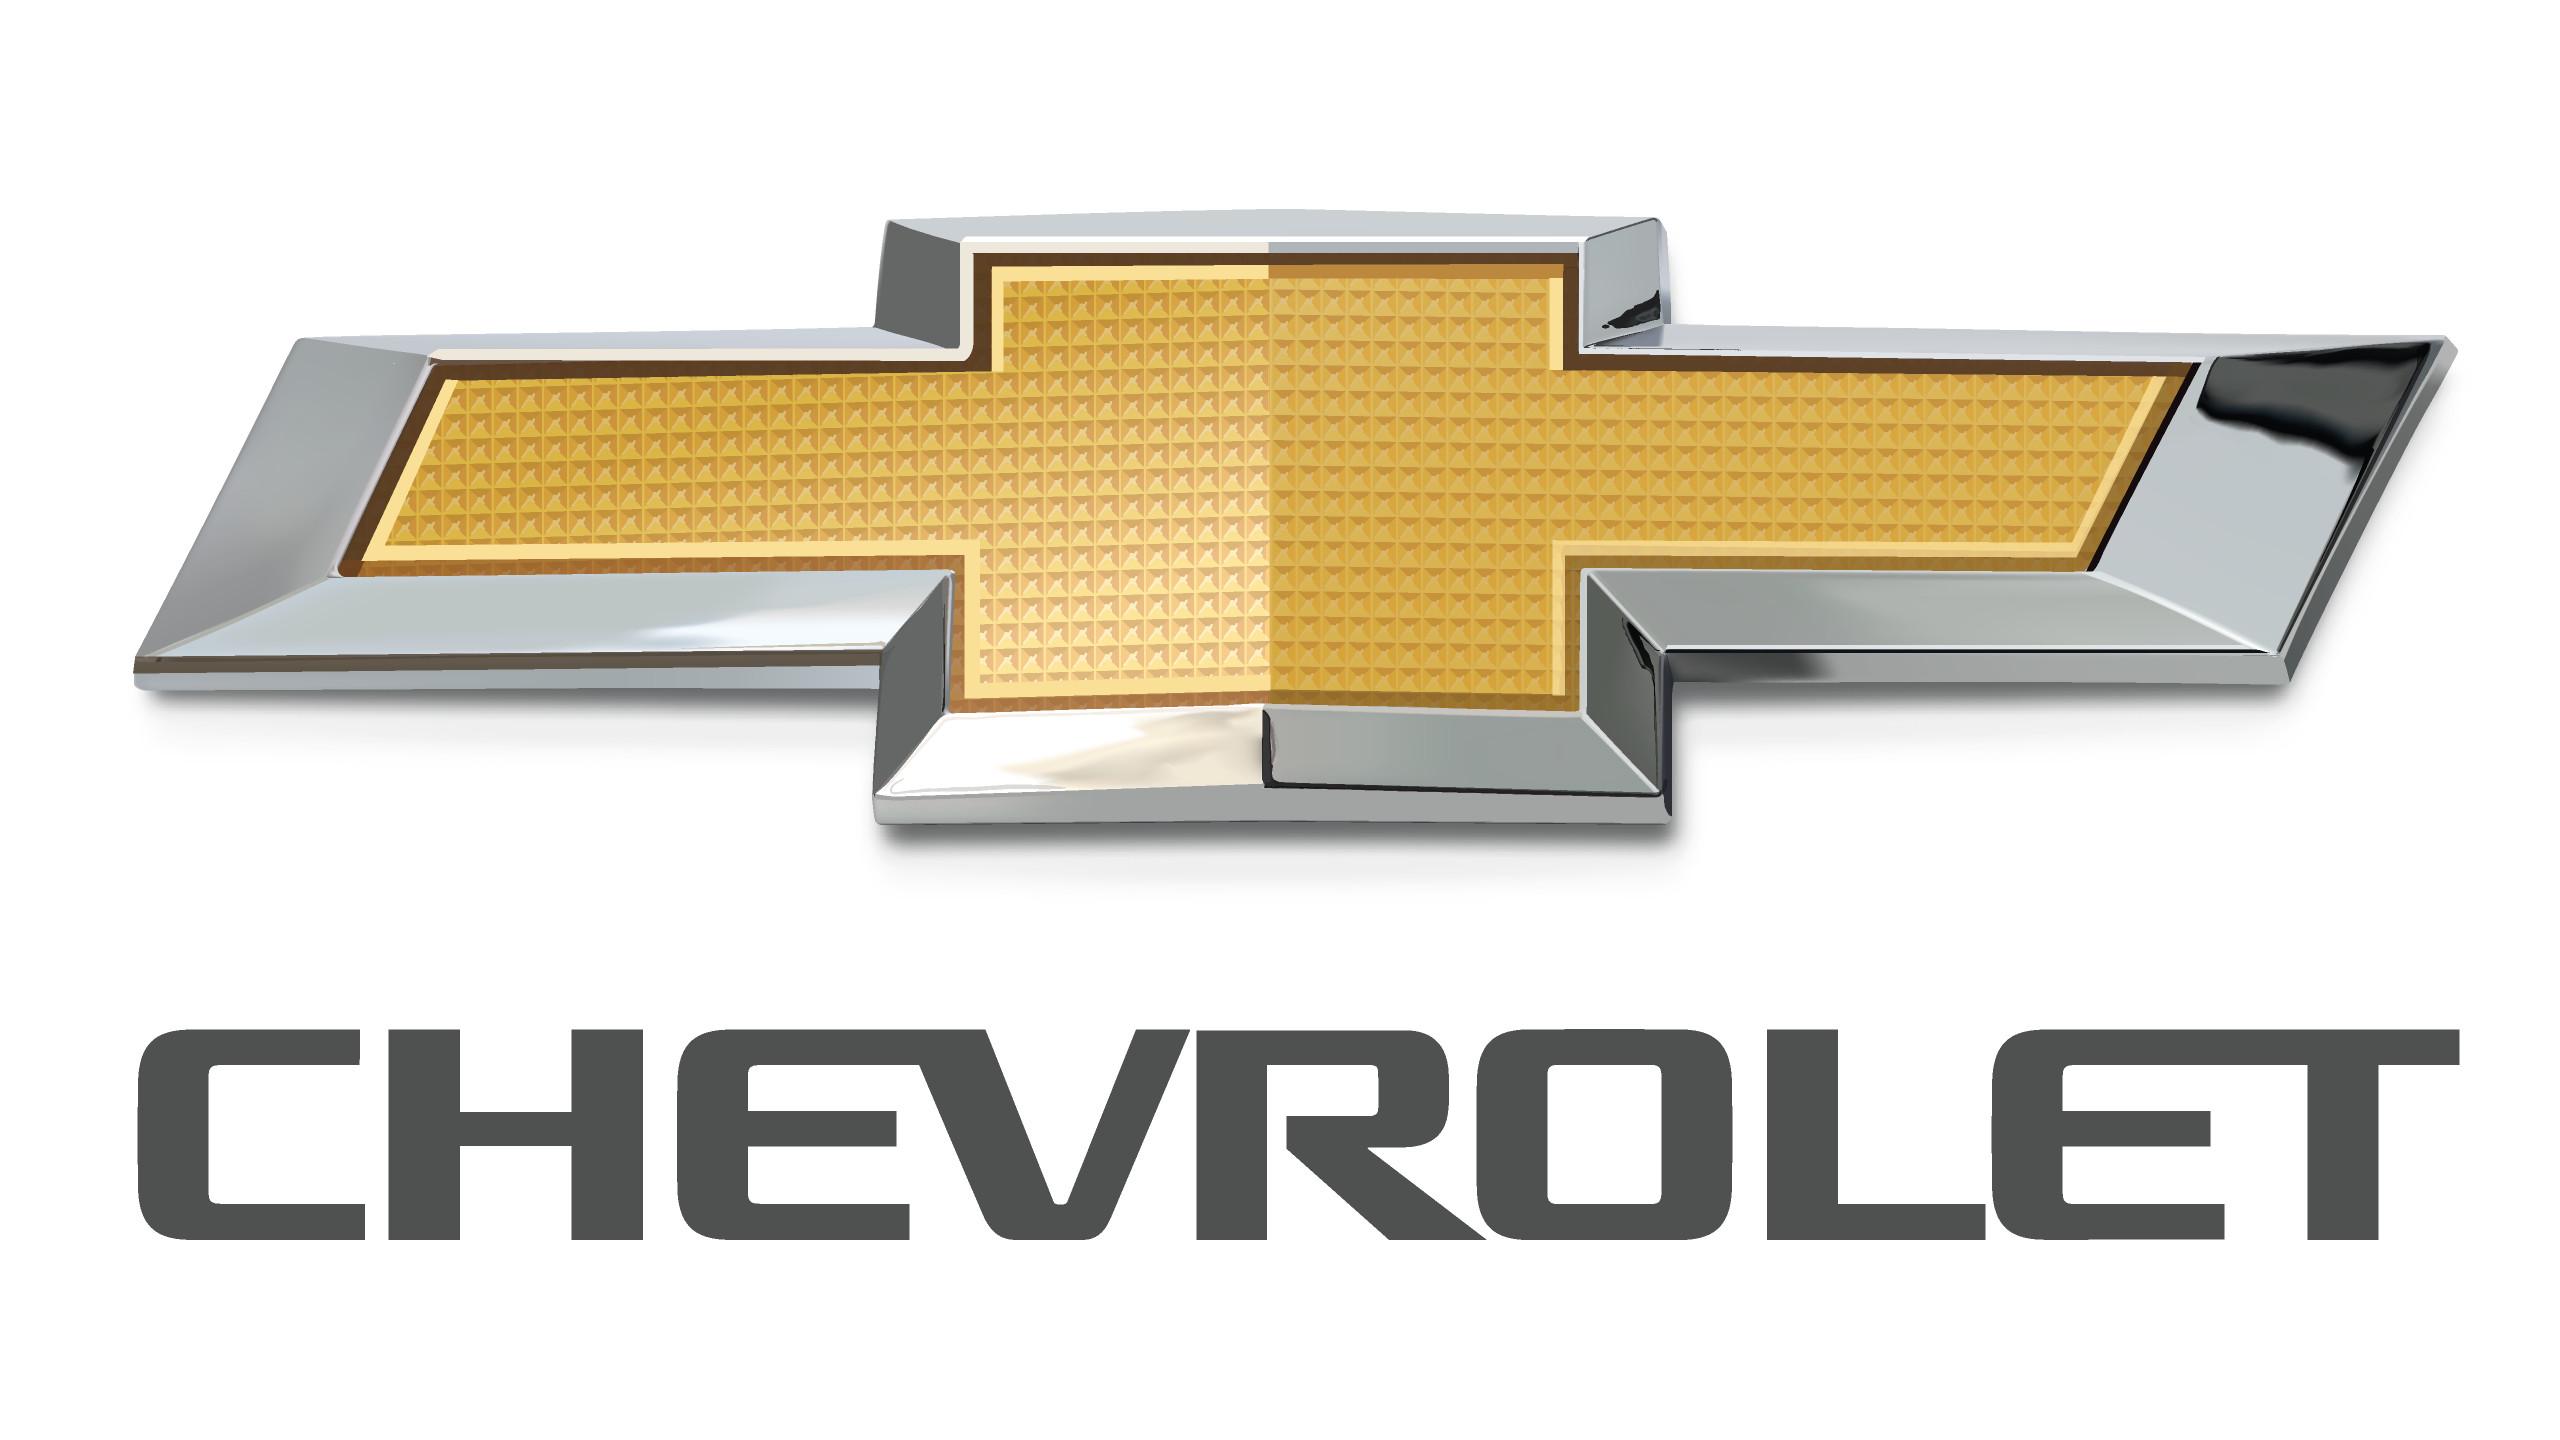 57 Chevy Logo Wallpaper Hd